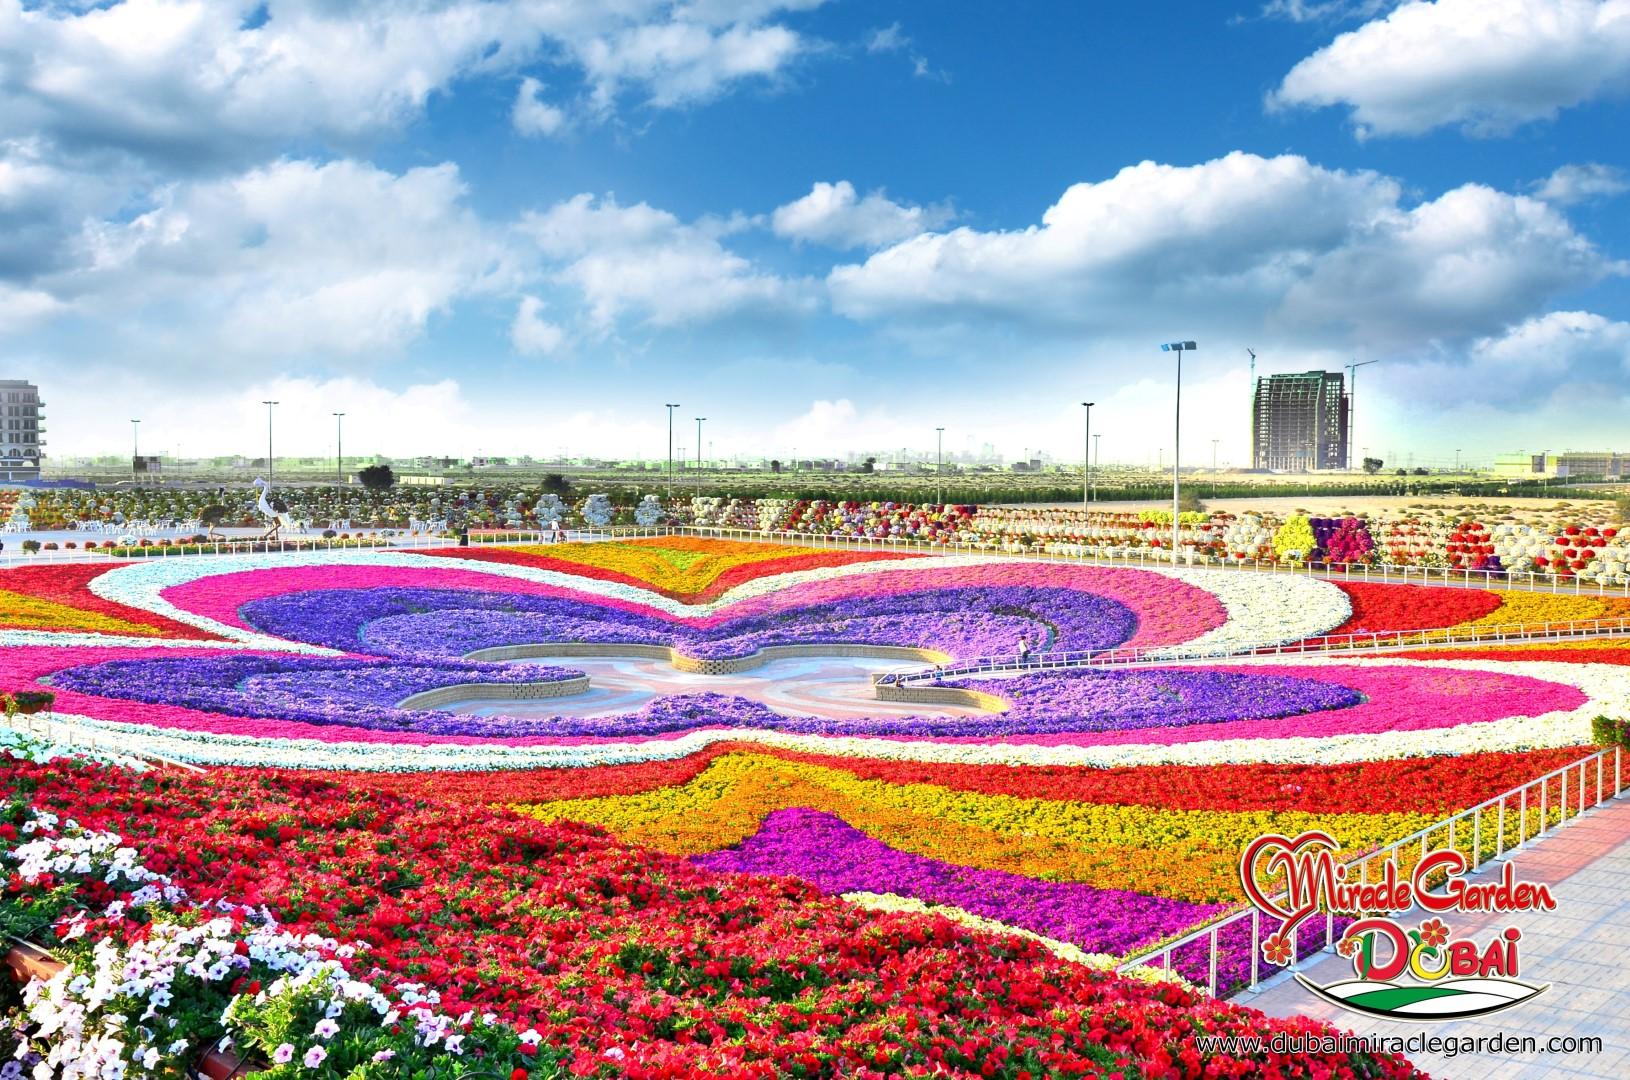 Dubai Miracle Garden: The World's Biggest Natural Flower